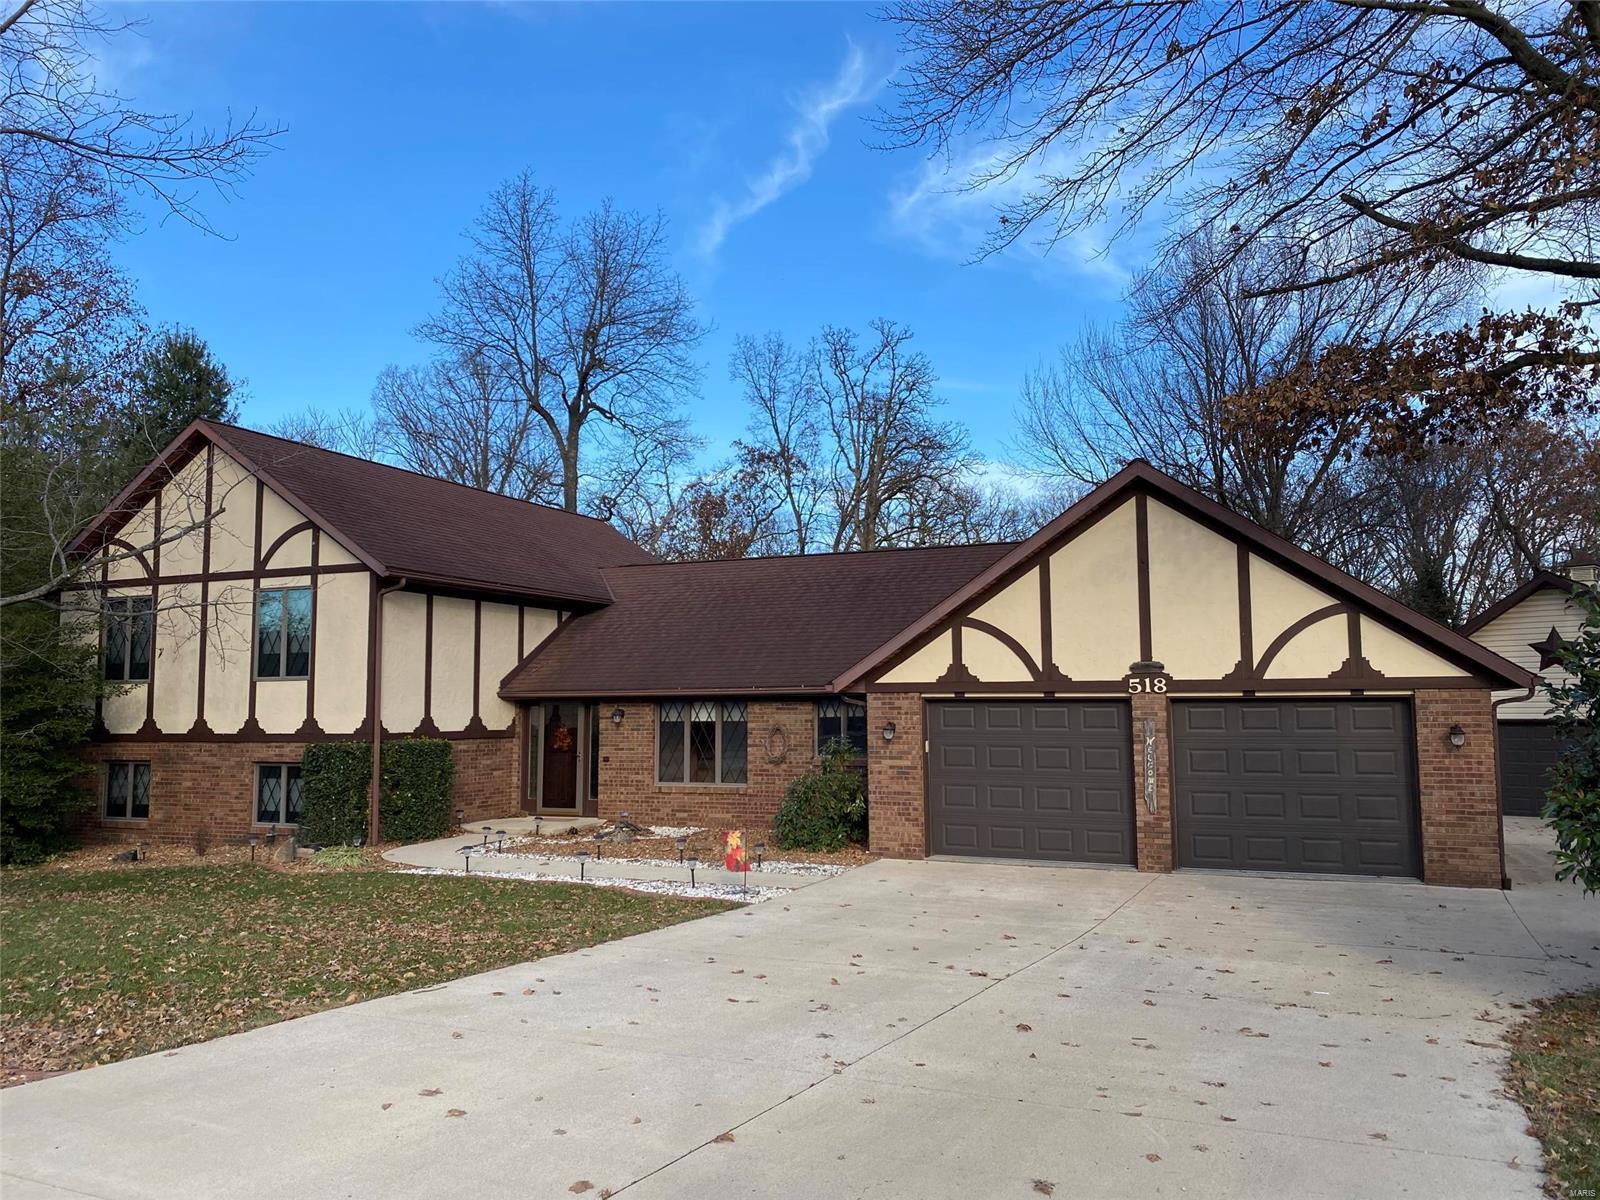 518 N Spruce Street Property Photo - Trenton, IL real estate listing